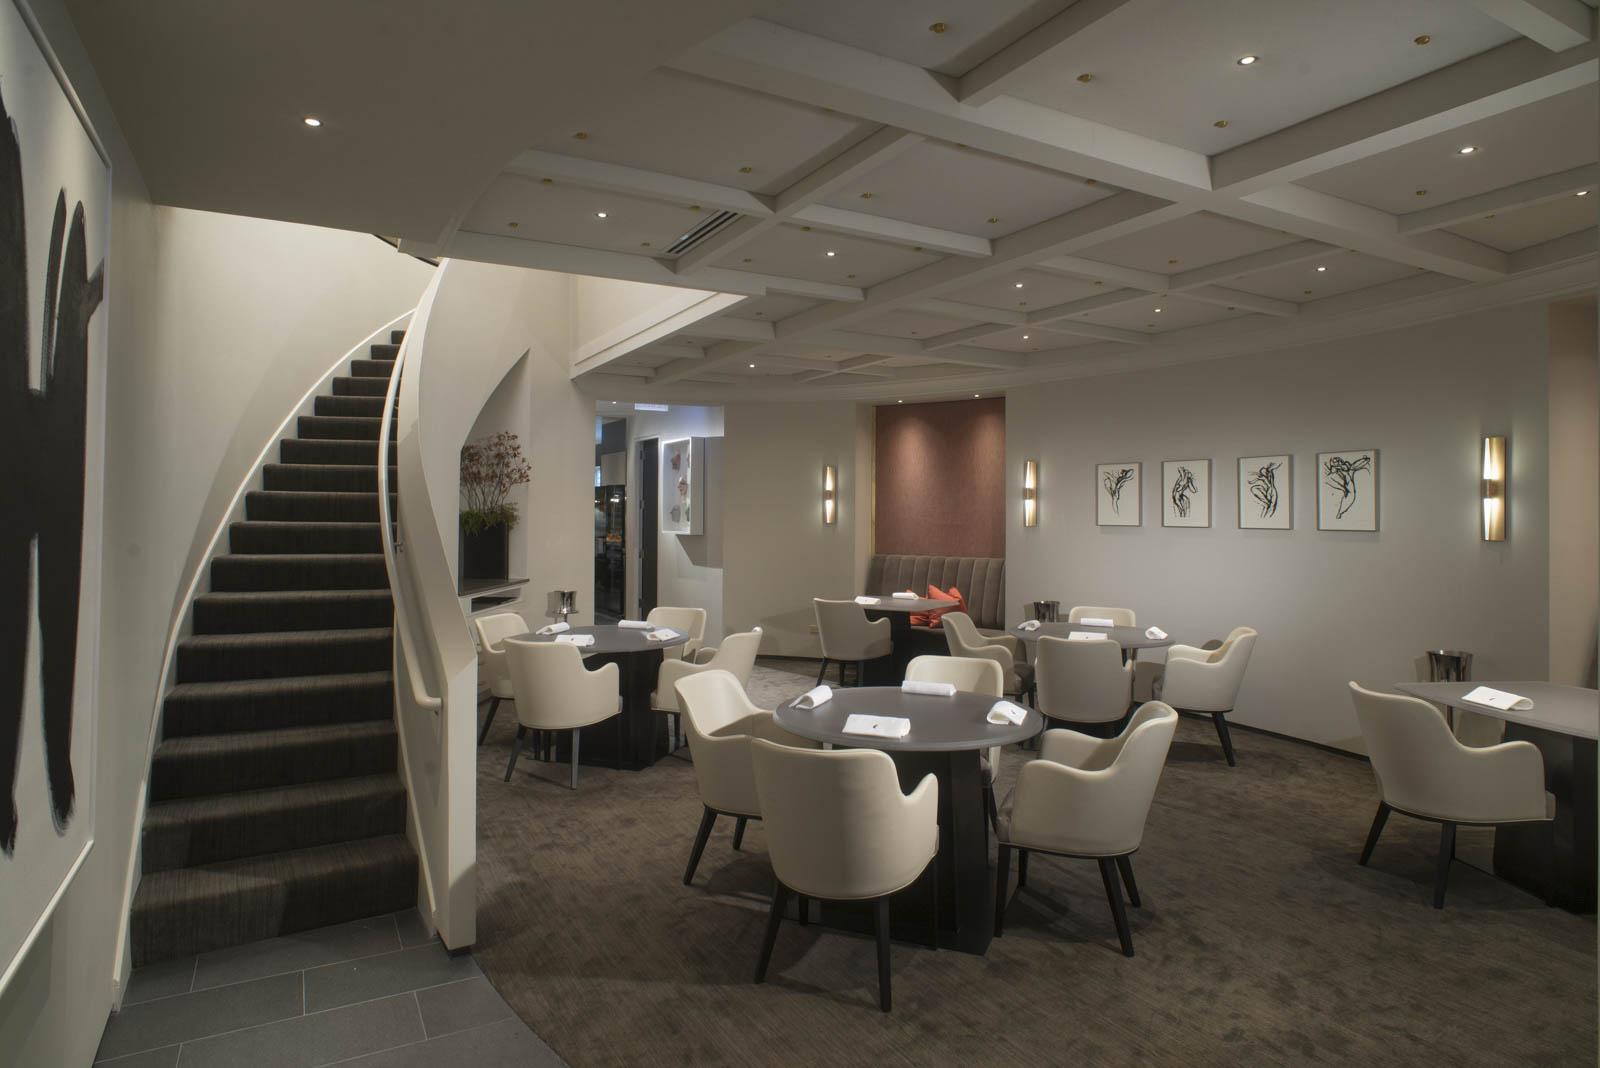 1469134881_travel-innovations-bloomberg-restaurant-alinea